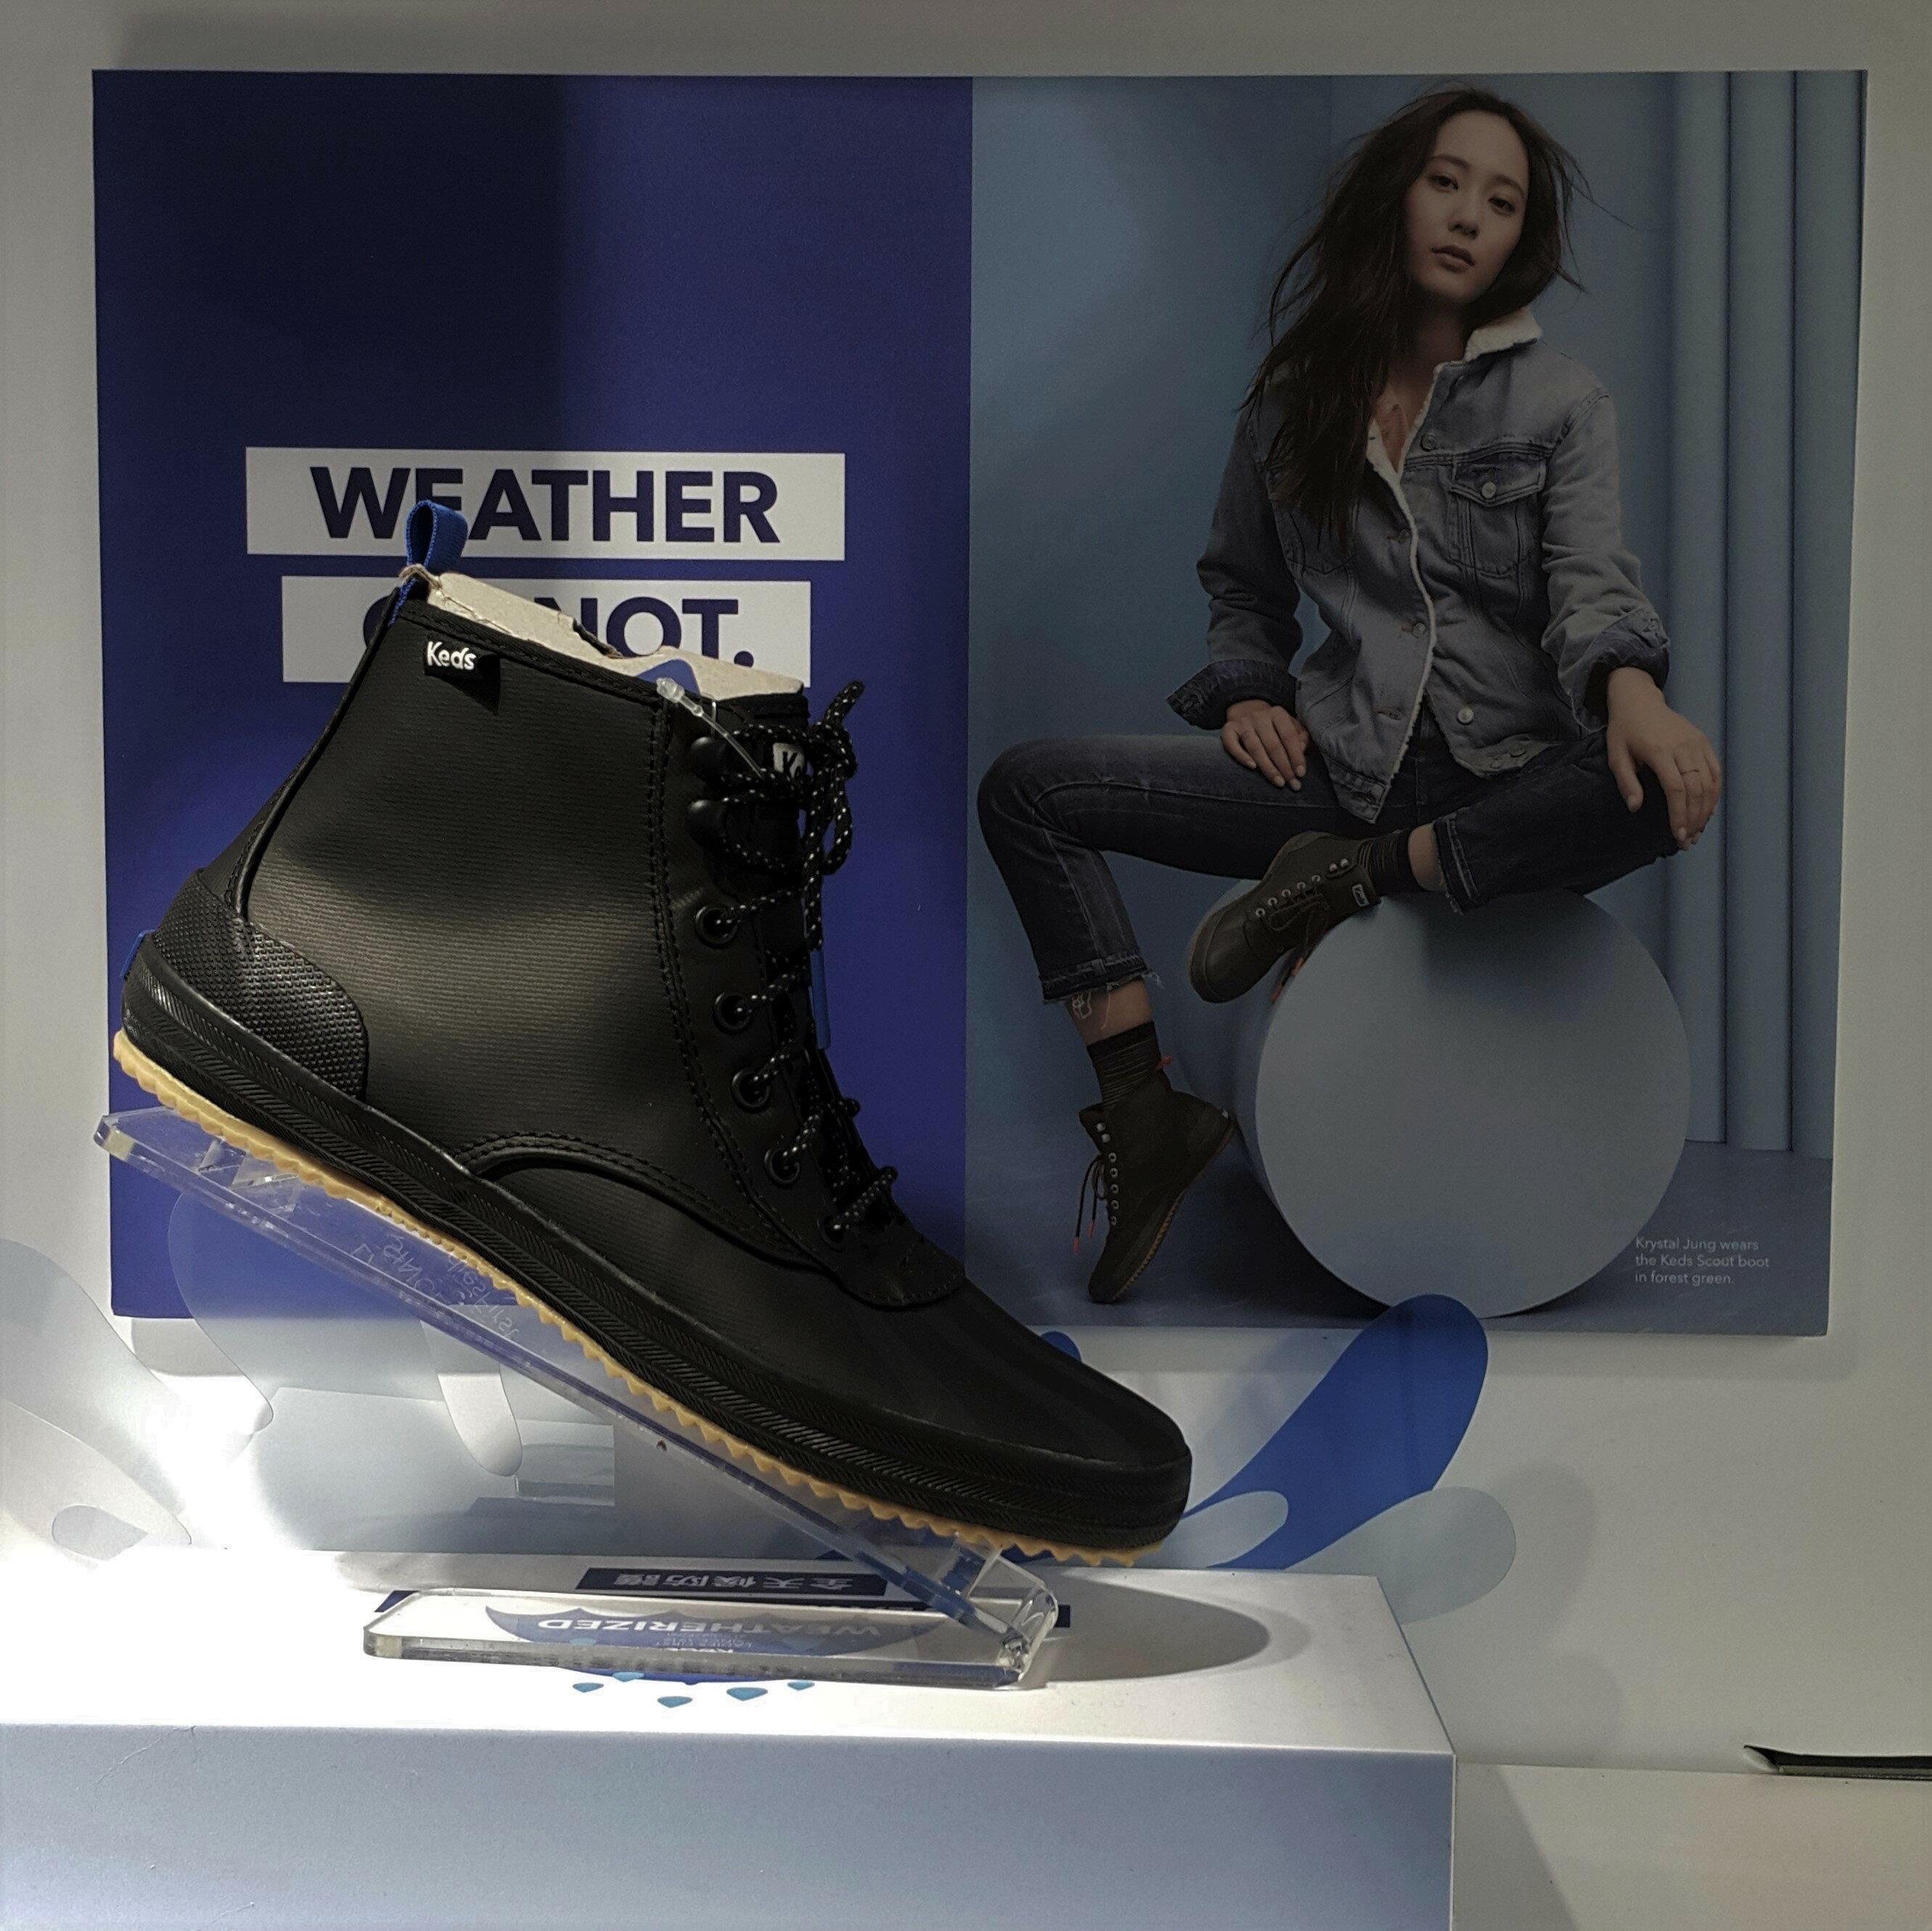 Keds SCOUT 雨靴 雨鞋 軍靴 靴款 高筒 防水 防潑水 黑色 Krystal 鄭秀晶 限時贈送Keds購物袋 送完為止